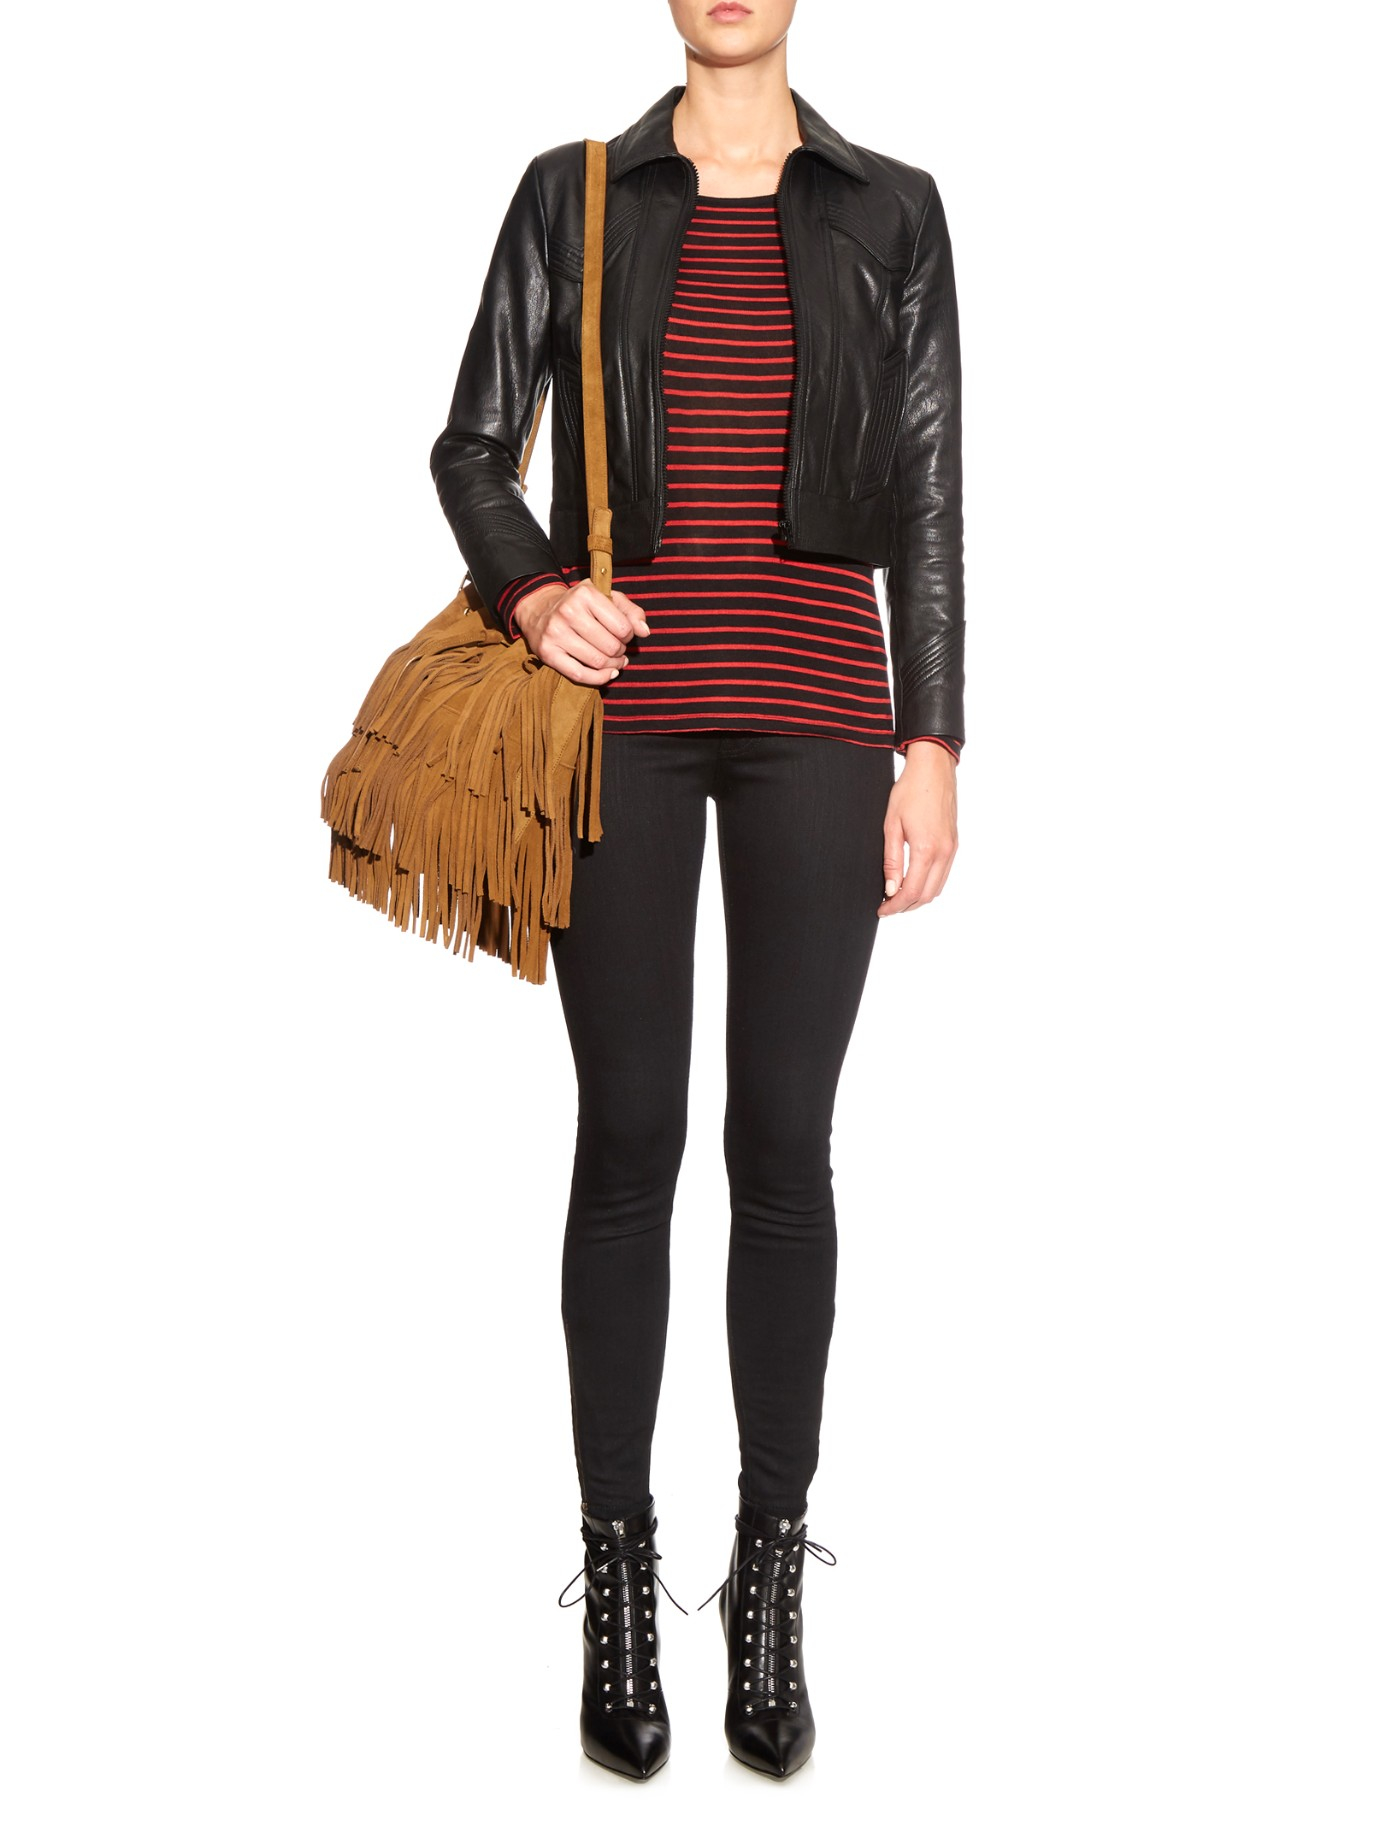 yves saint laurent cabas chyc satchel large - emmanuelle suede leopard-print fringe bucket bag, tan/black